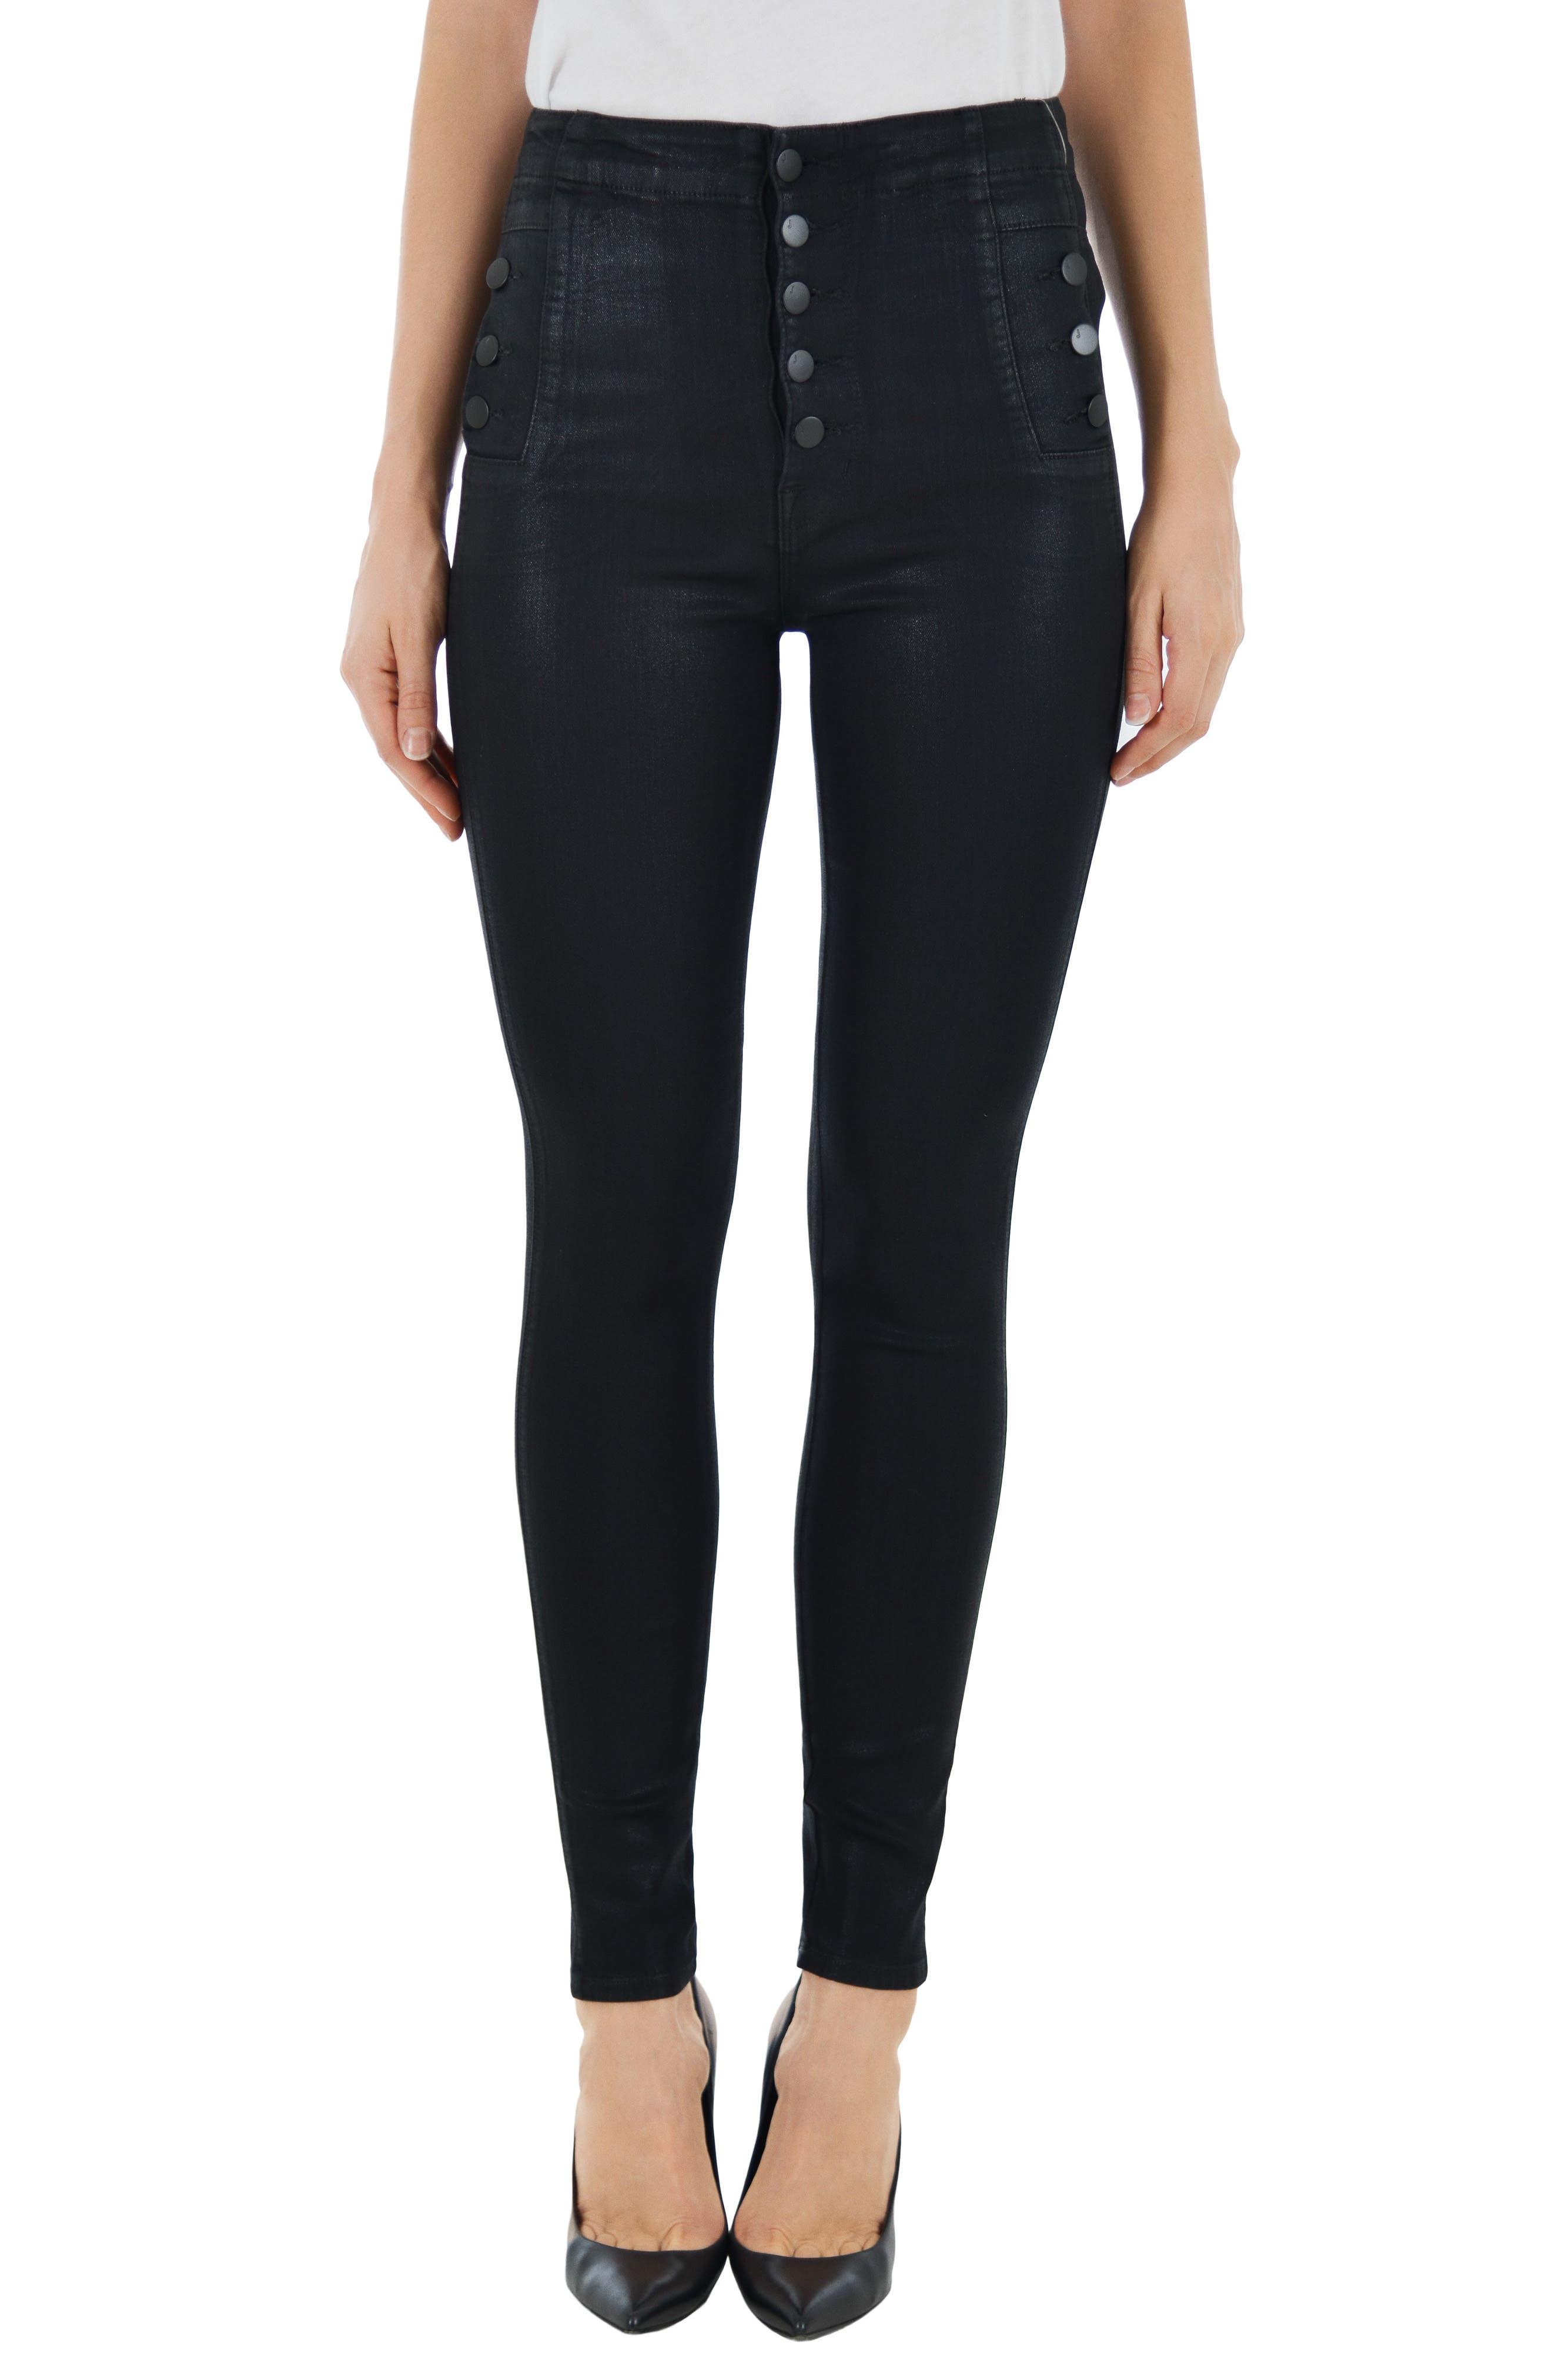 Alternate Image 1 Selected - J Brand Natasha Sky High Skinny Jeans (Fearless)